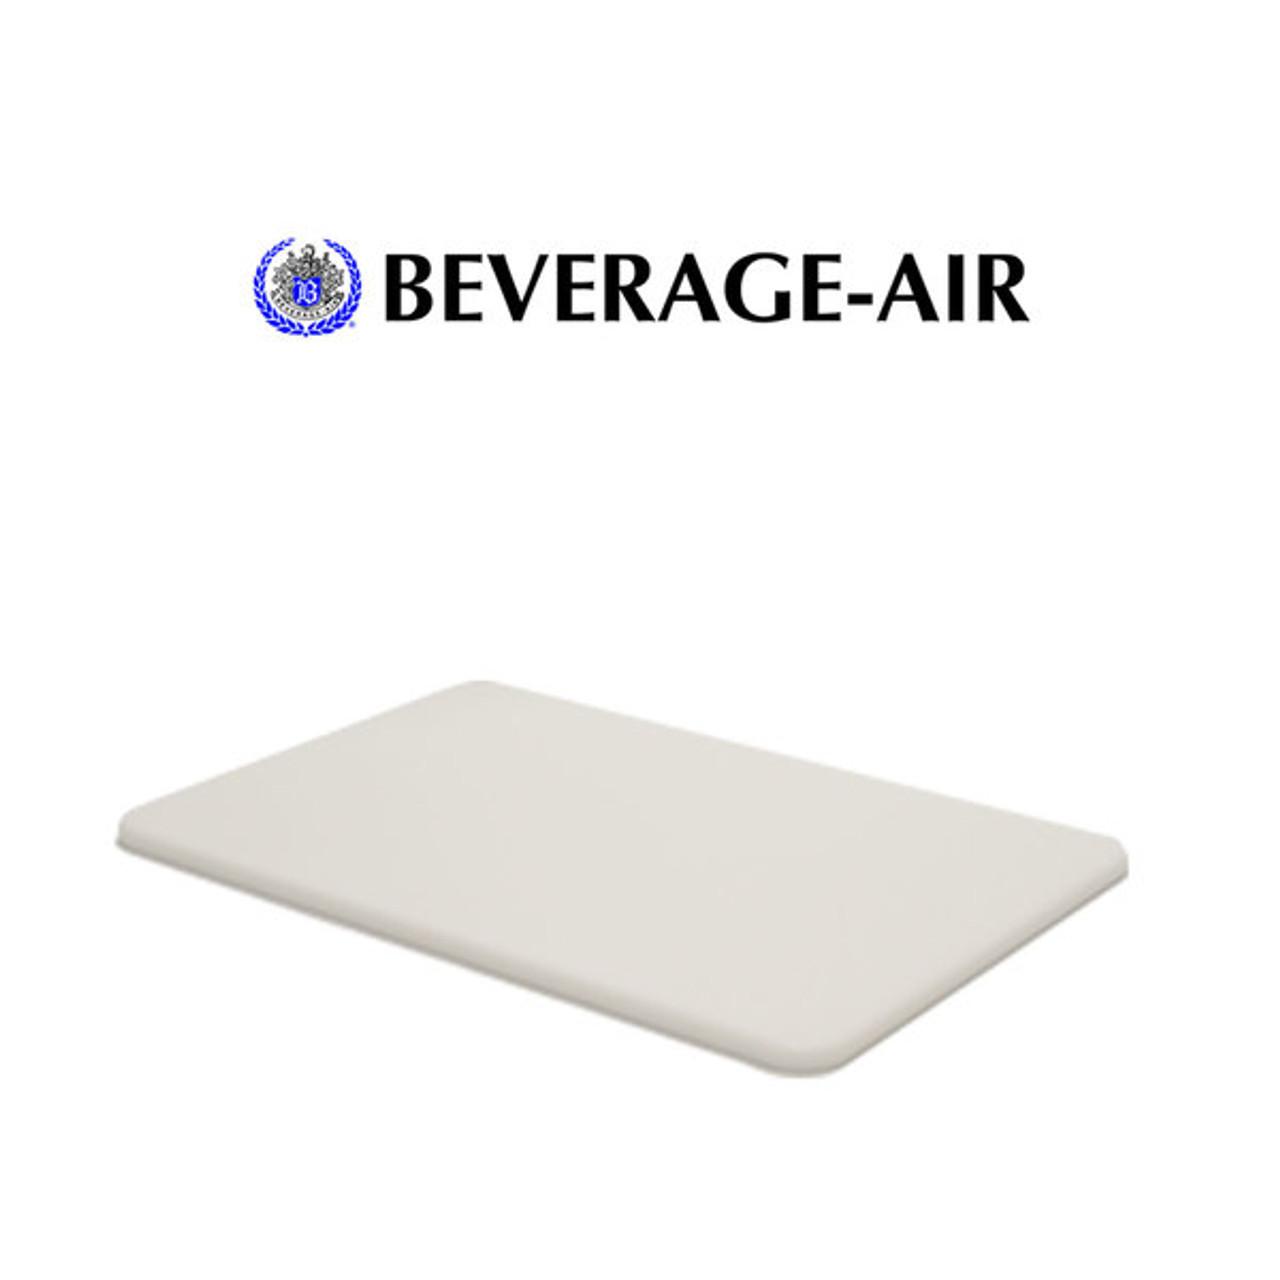 OEM Cutting Board - Beverage Air - P#: 705-290C-04